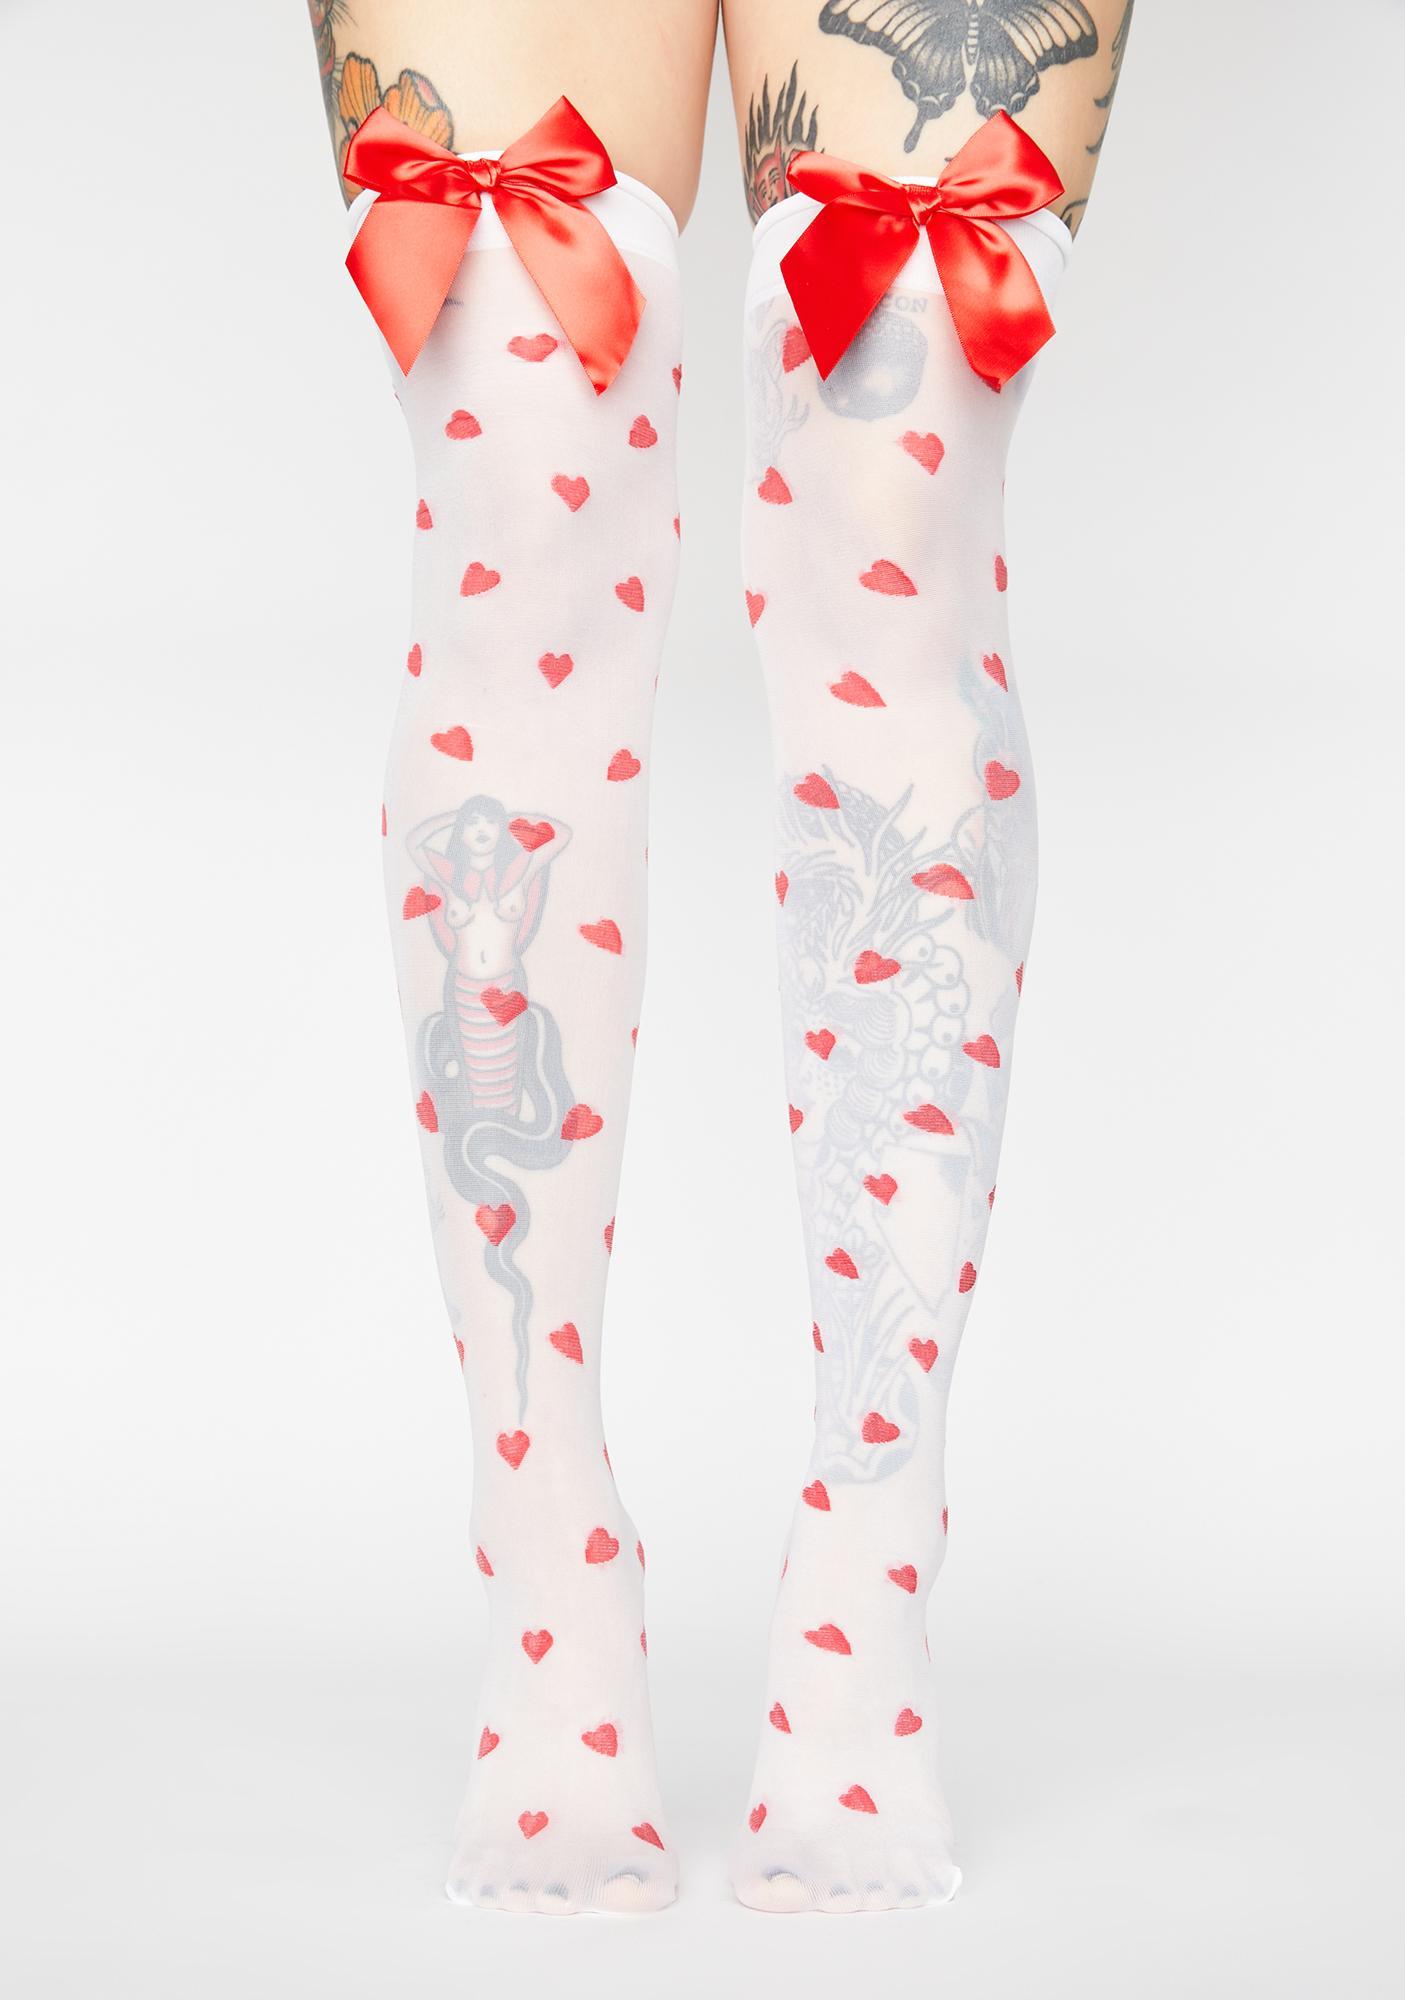 Ur Sweetheart Thigh High Stockings